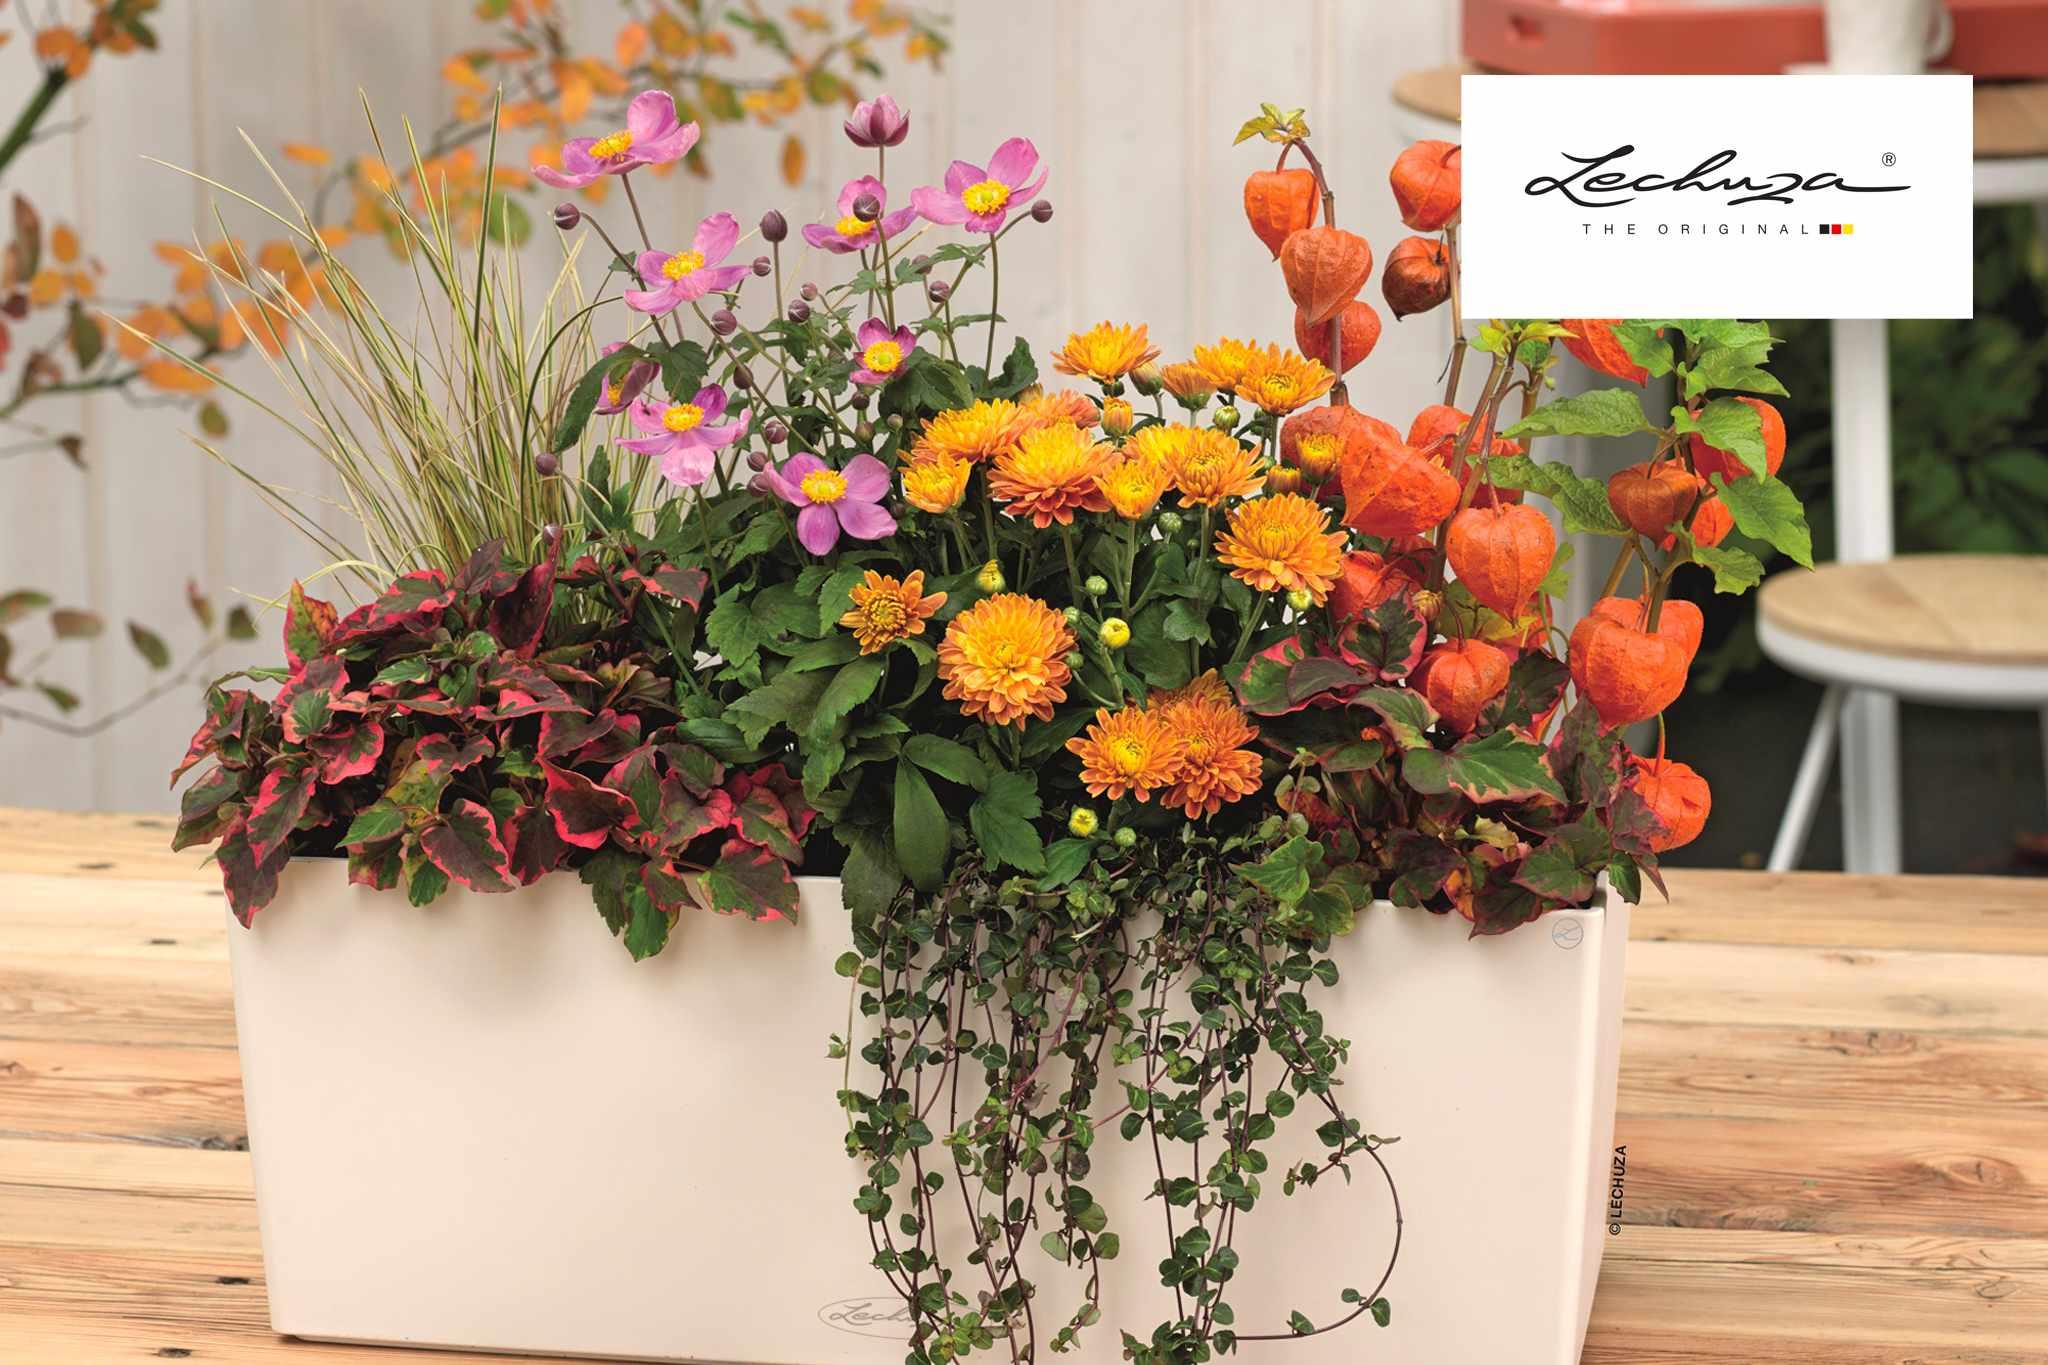 Win a self-watering planter by Lechuza - BBC Gardeners' World Magazine